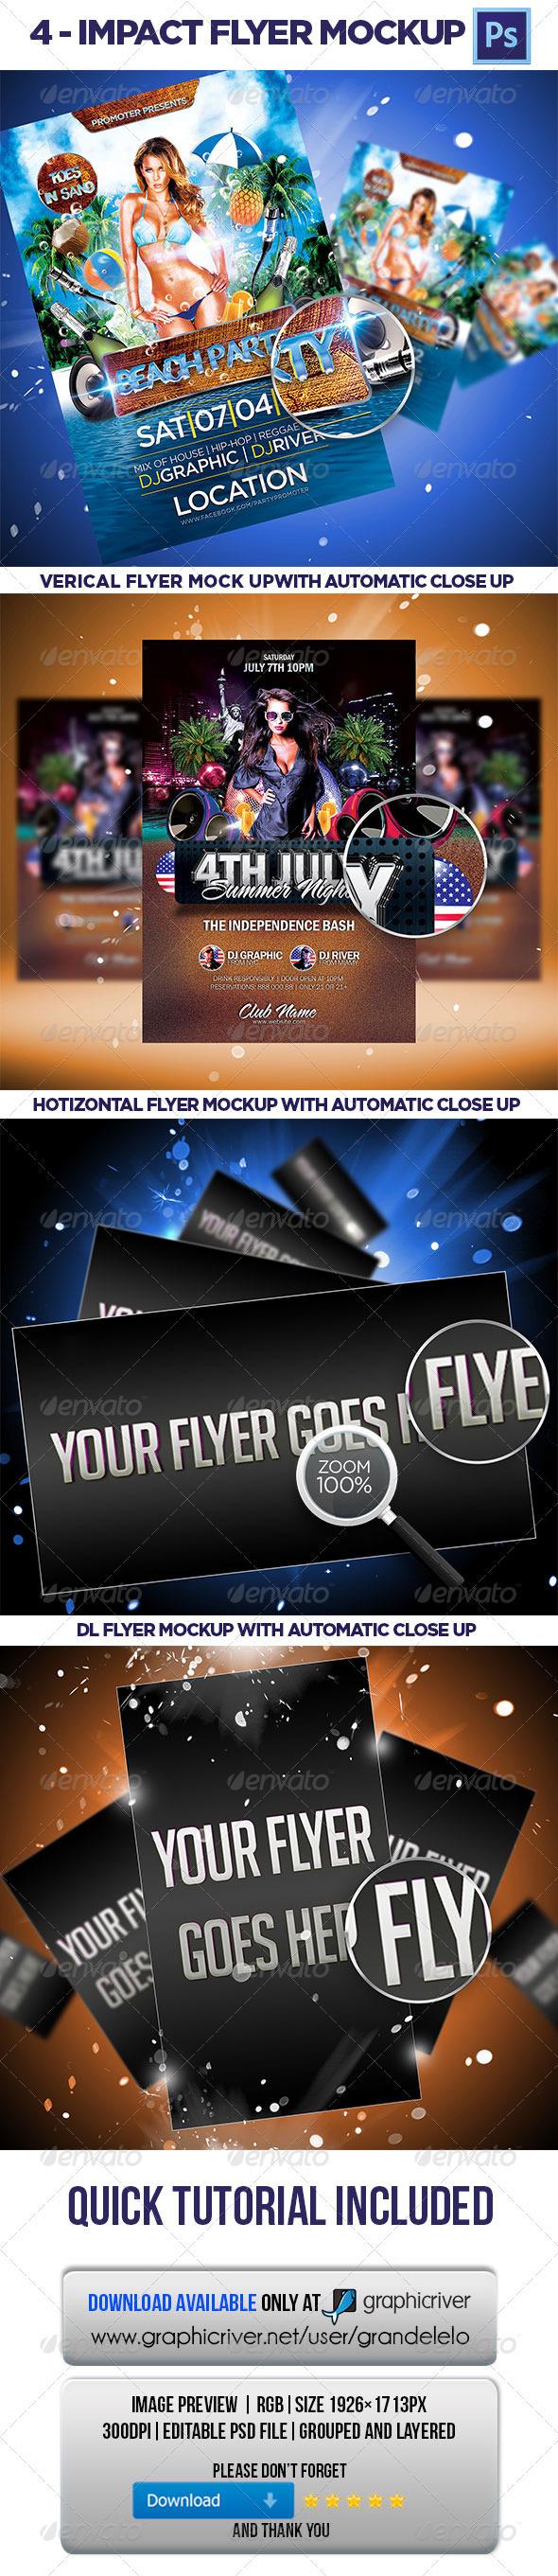 4 Impact Flayer Mockup - Flyers Print